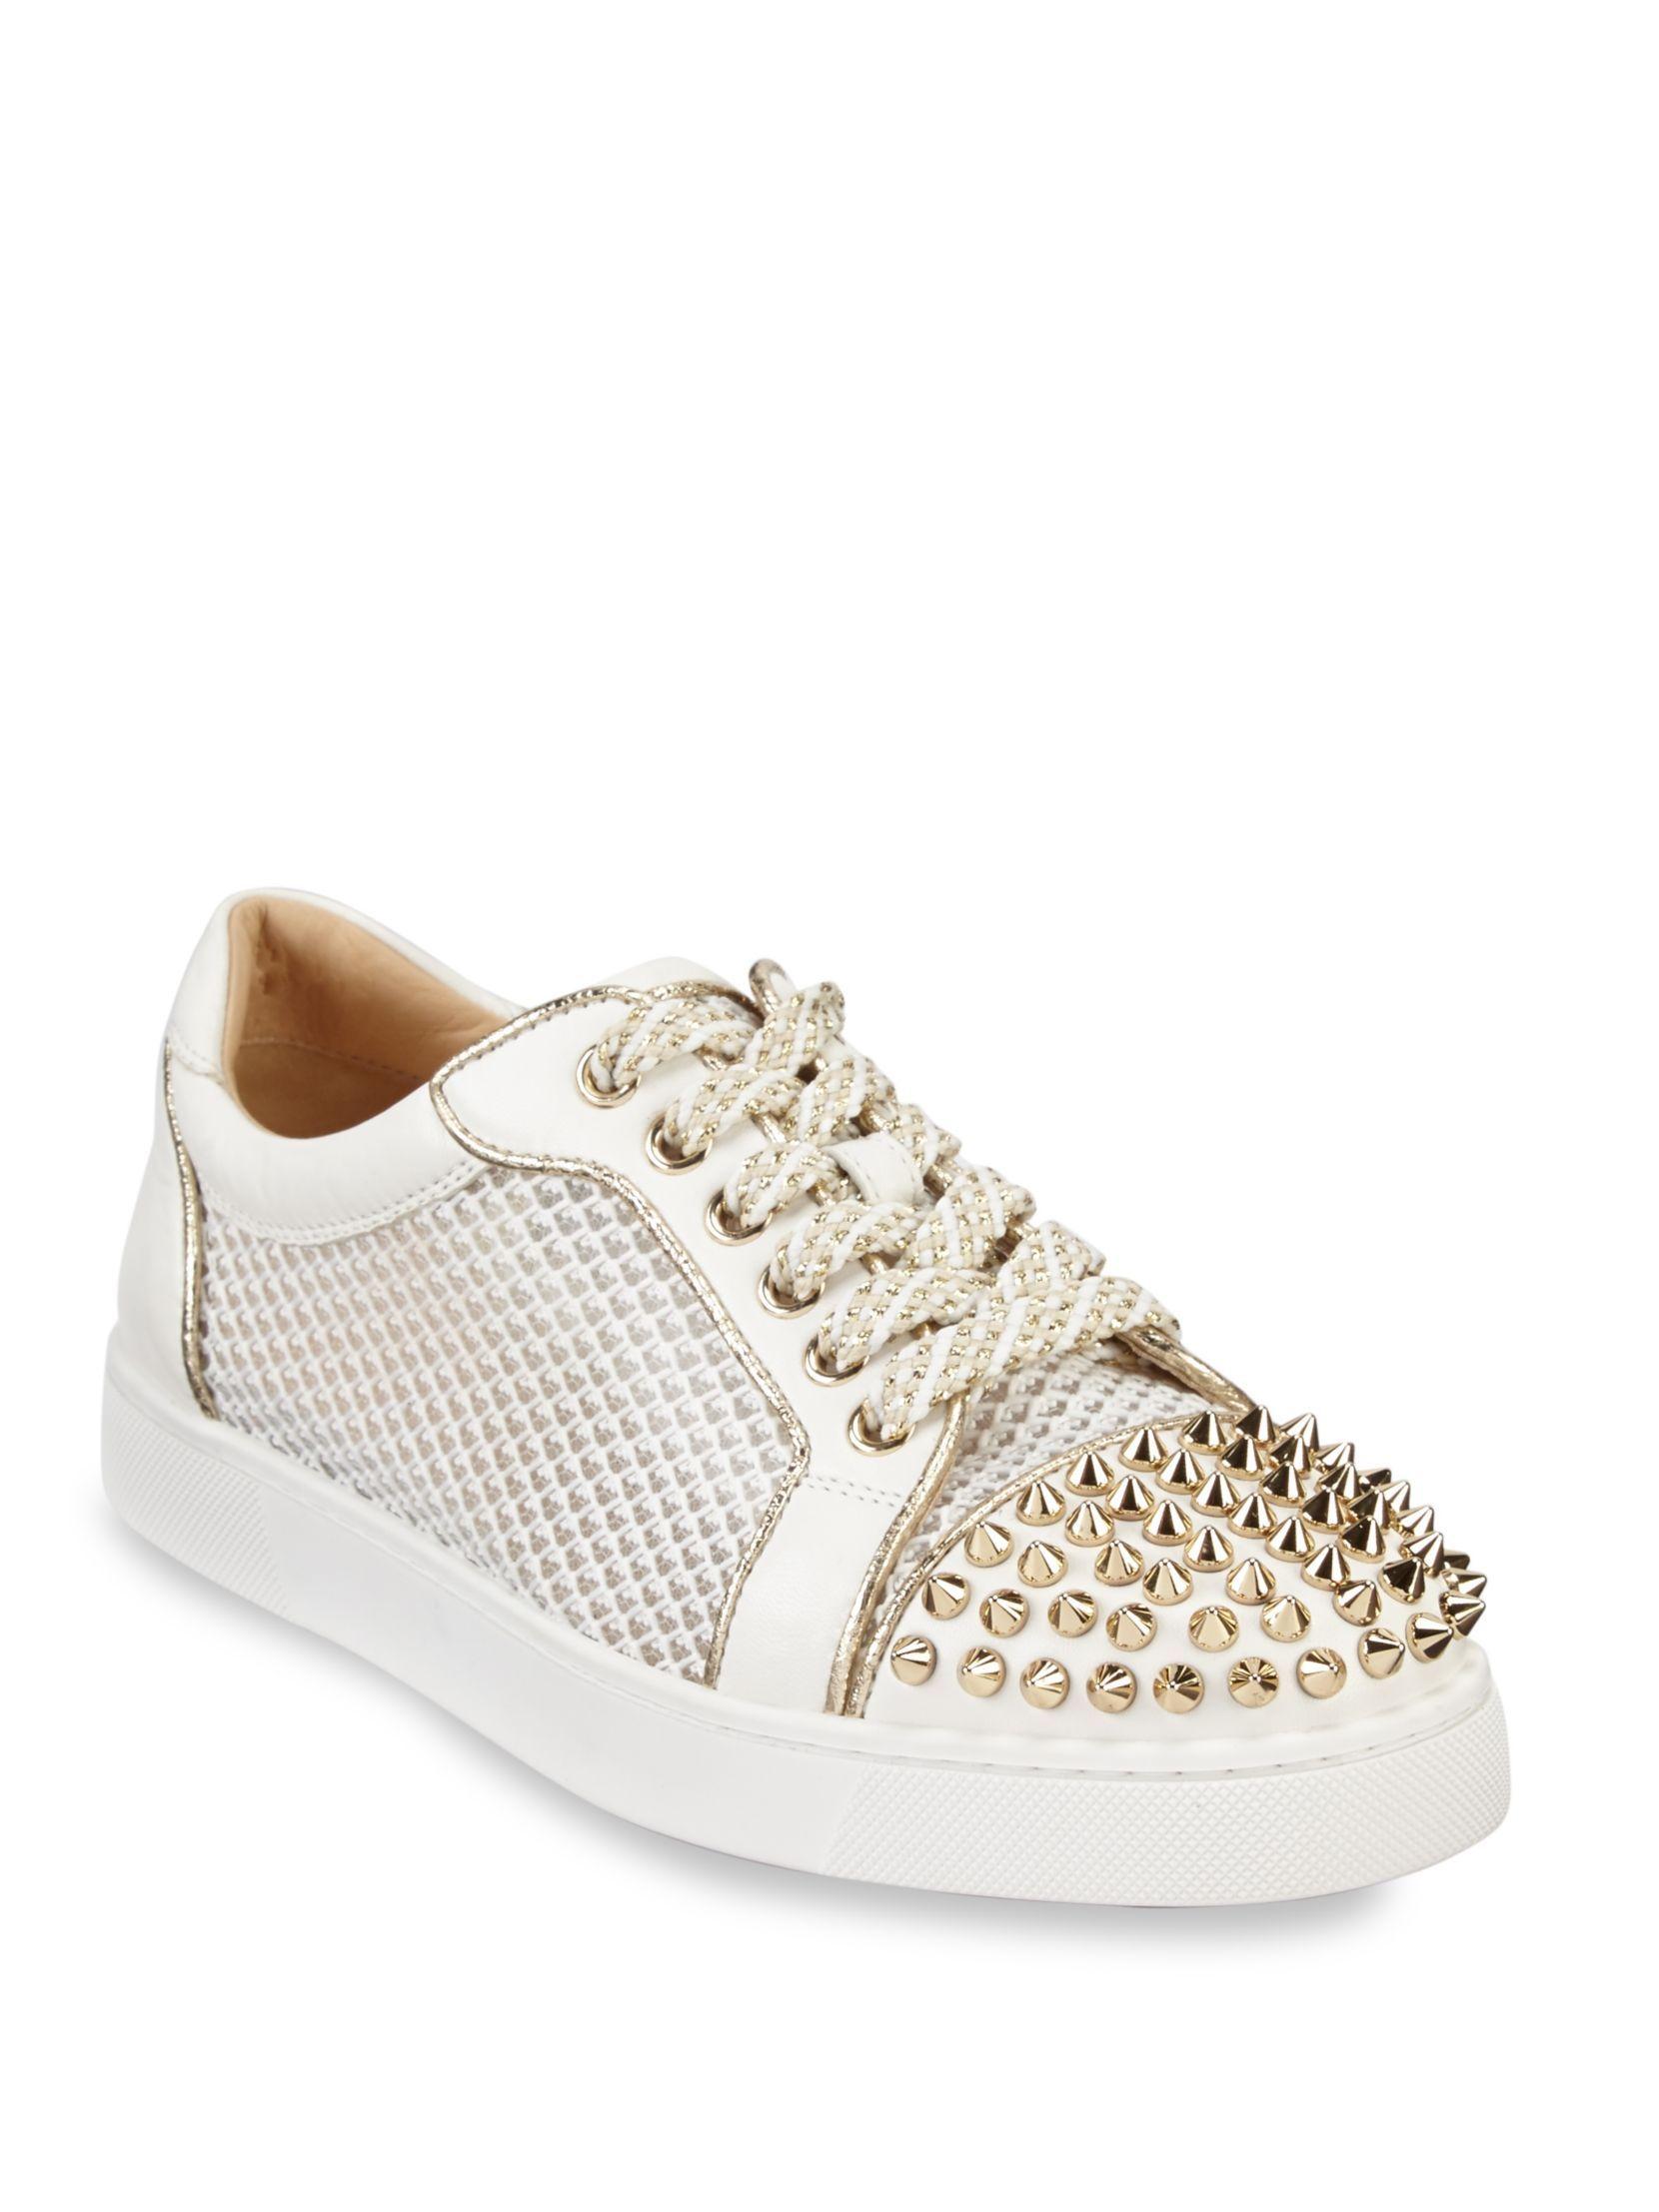 Christian Louboutin AC Vieria Spikes Sneakers NrUcEIg